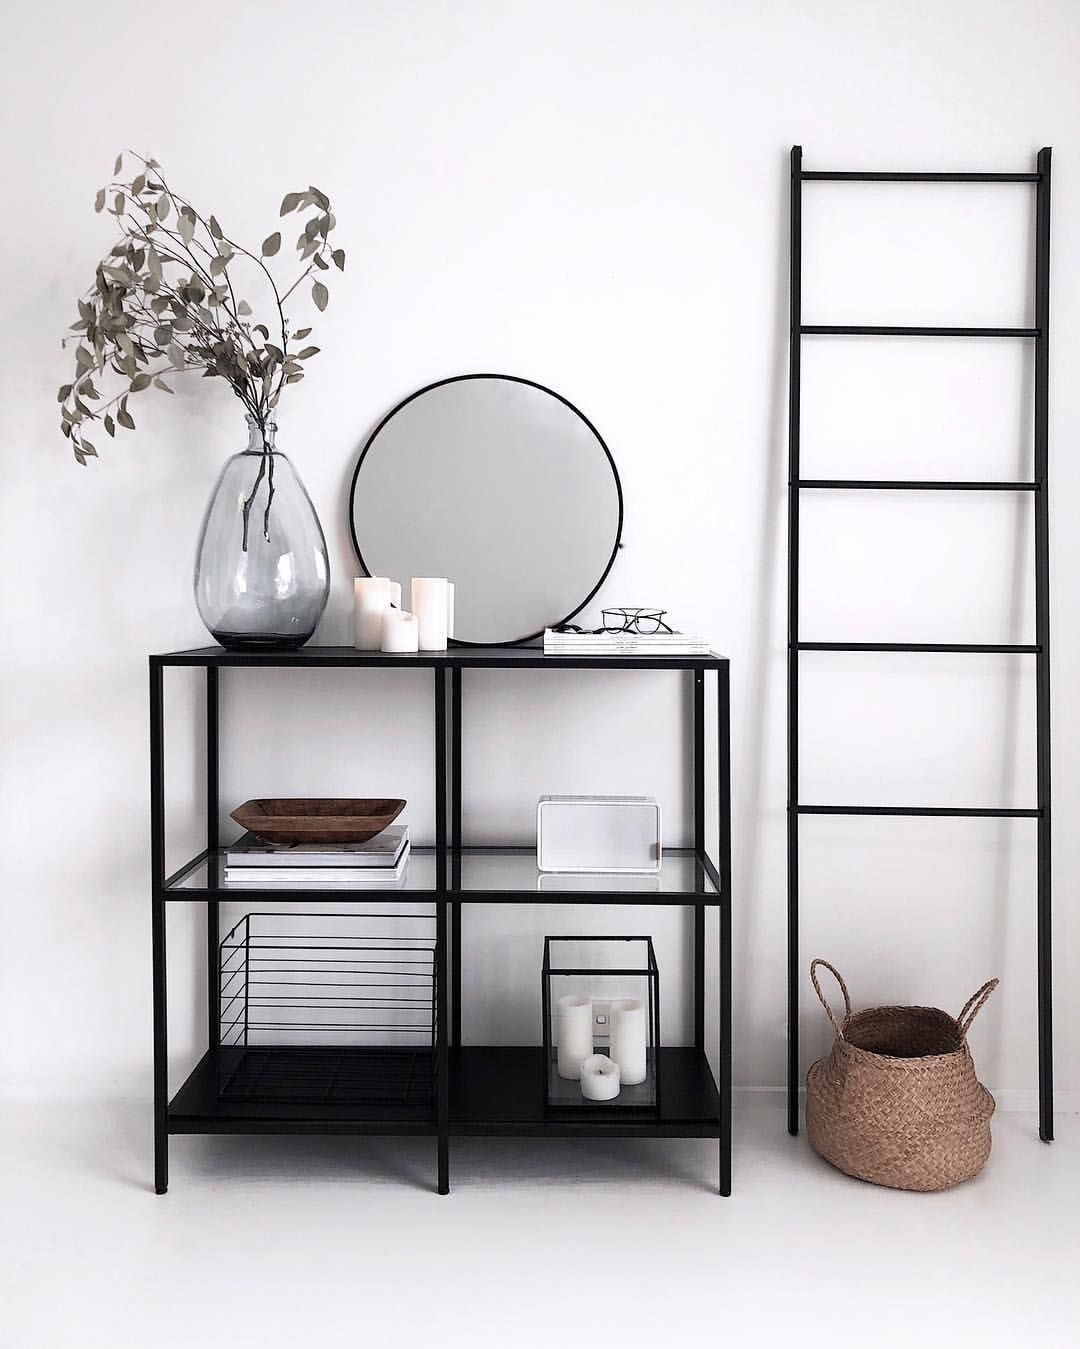 S H E L F I E • • • My Favourite Shelf! The @ikea